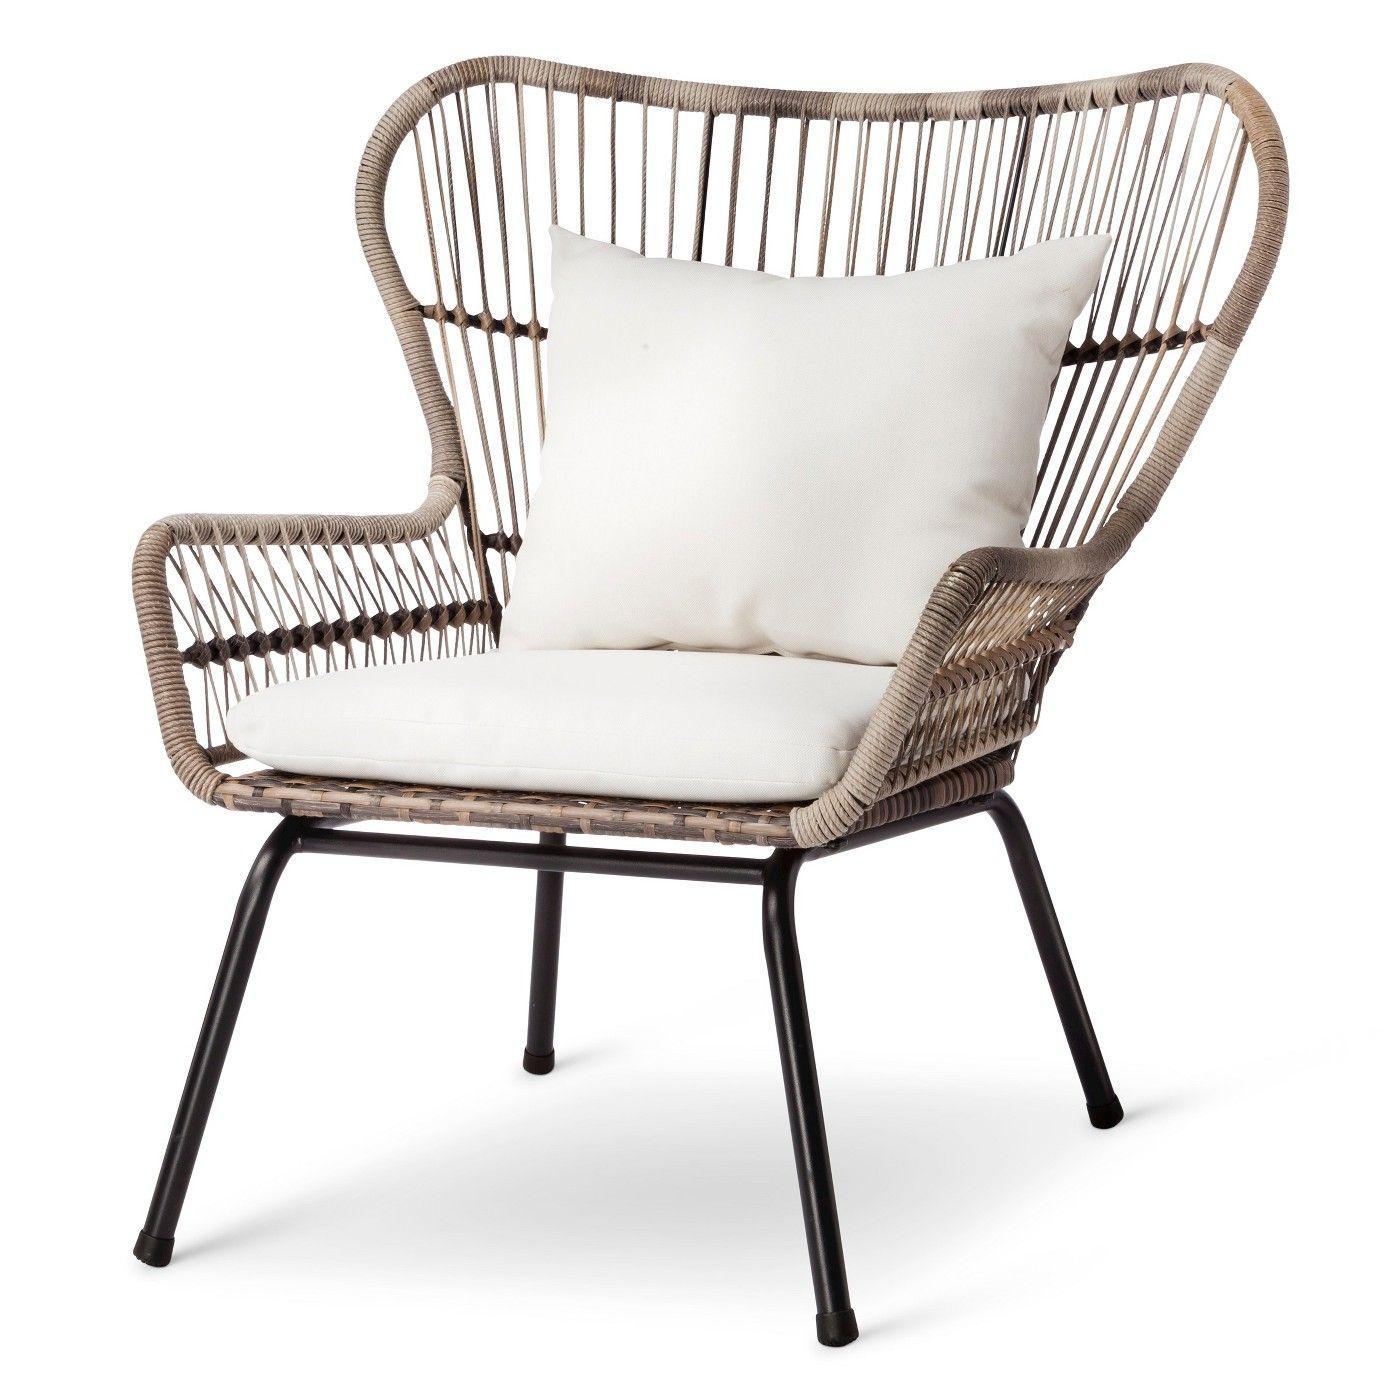 All Weather Wicker Outdoor Chairs Ikea Poang Latigo 3pc Patio Chat Set Tan Threshold Image 3 Of 6